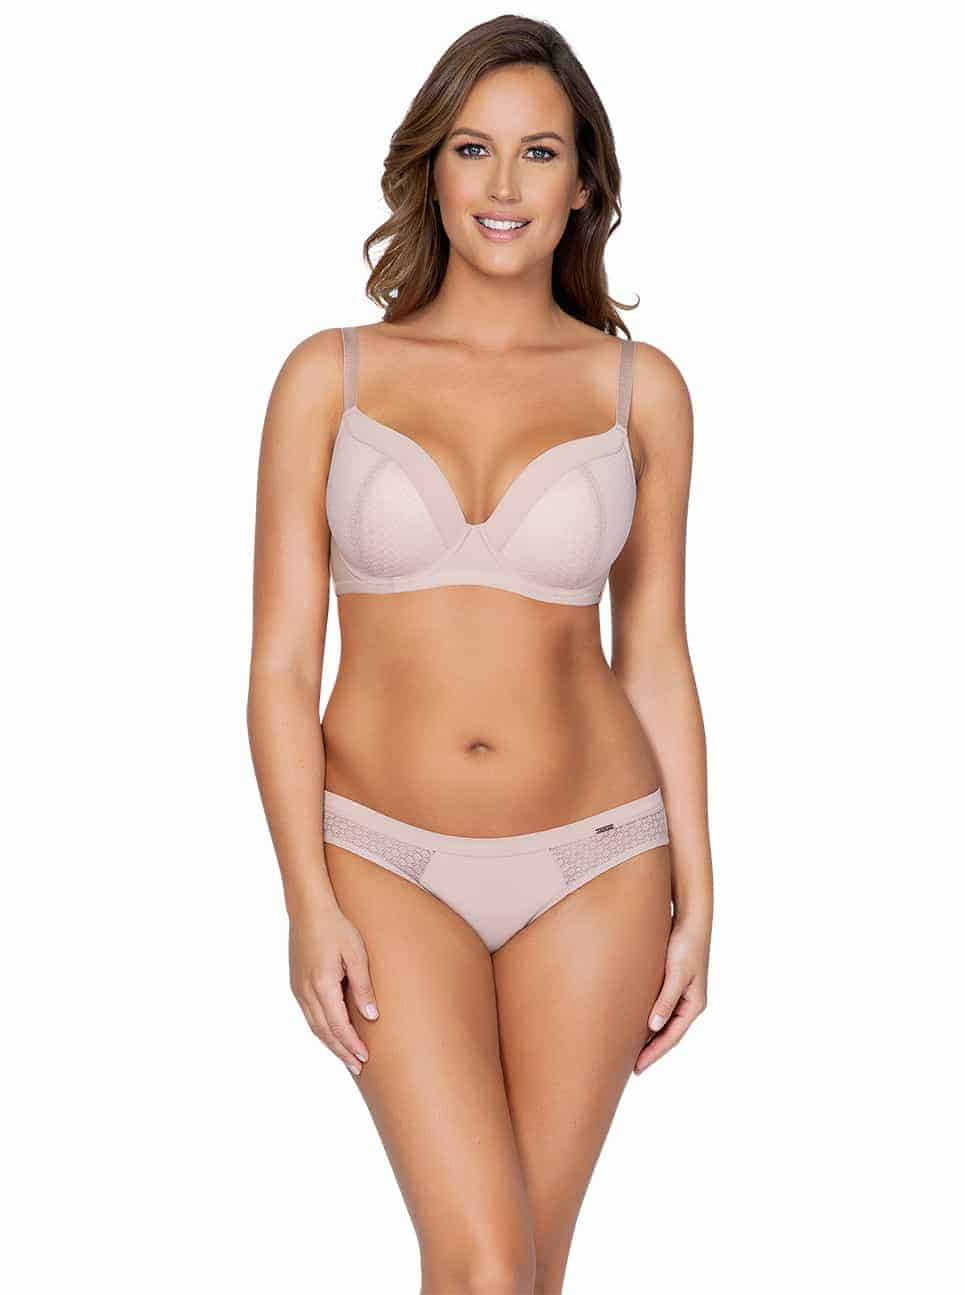 WendyP5411 PlungePadded P5413 BikiniNudeFront - Wendy Bikini – Victorian Rose – P5413